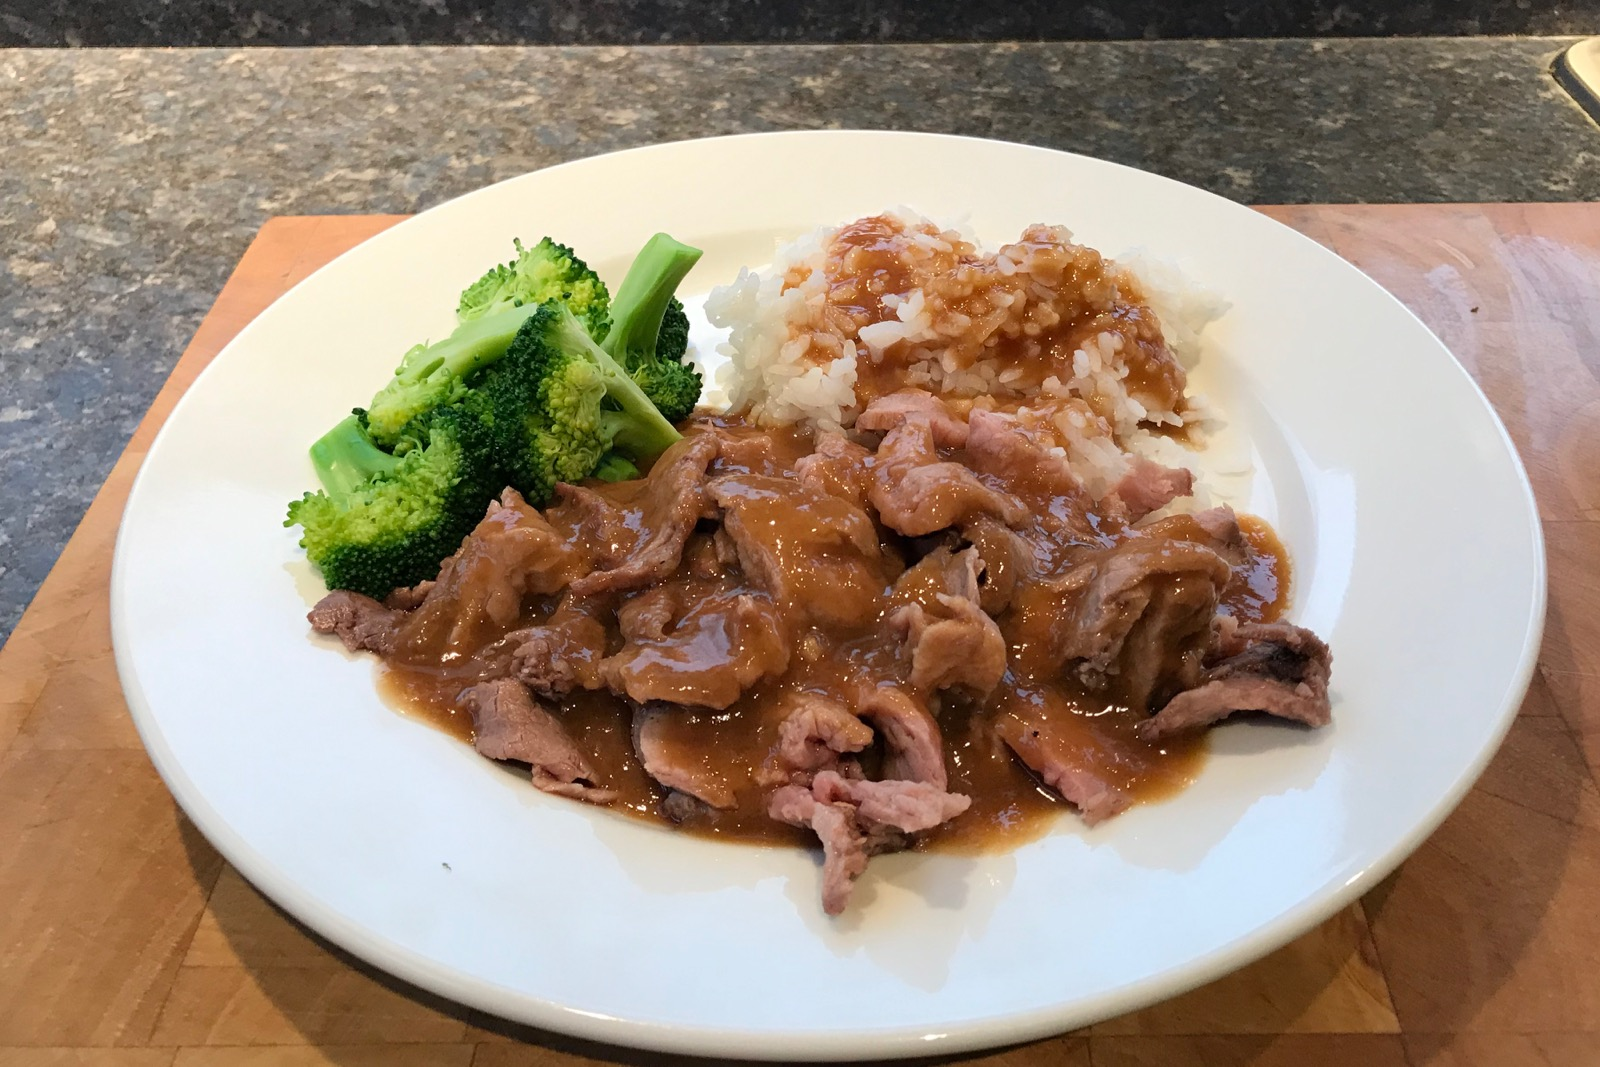 http://blog.rickk.com/food/2018/11/28/ate.2018.11.28.d.jpg